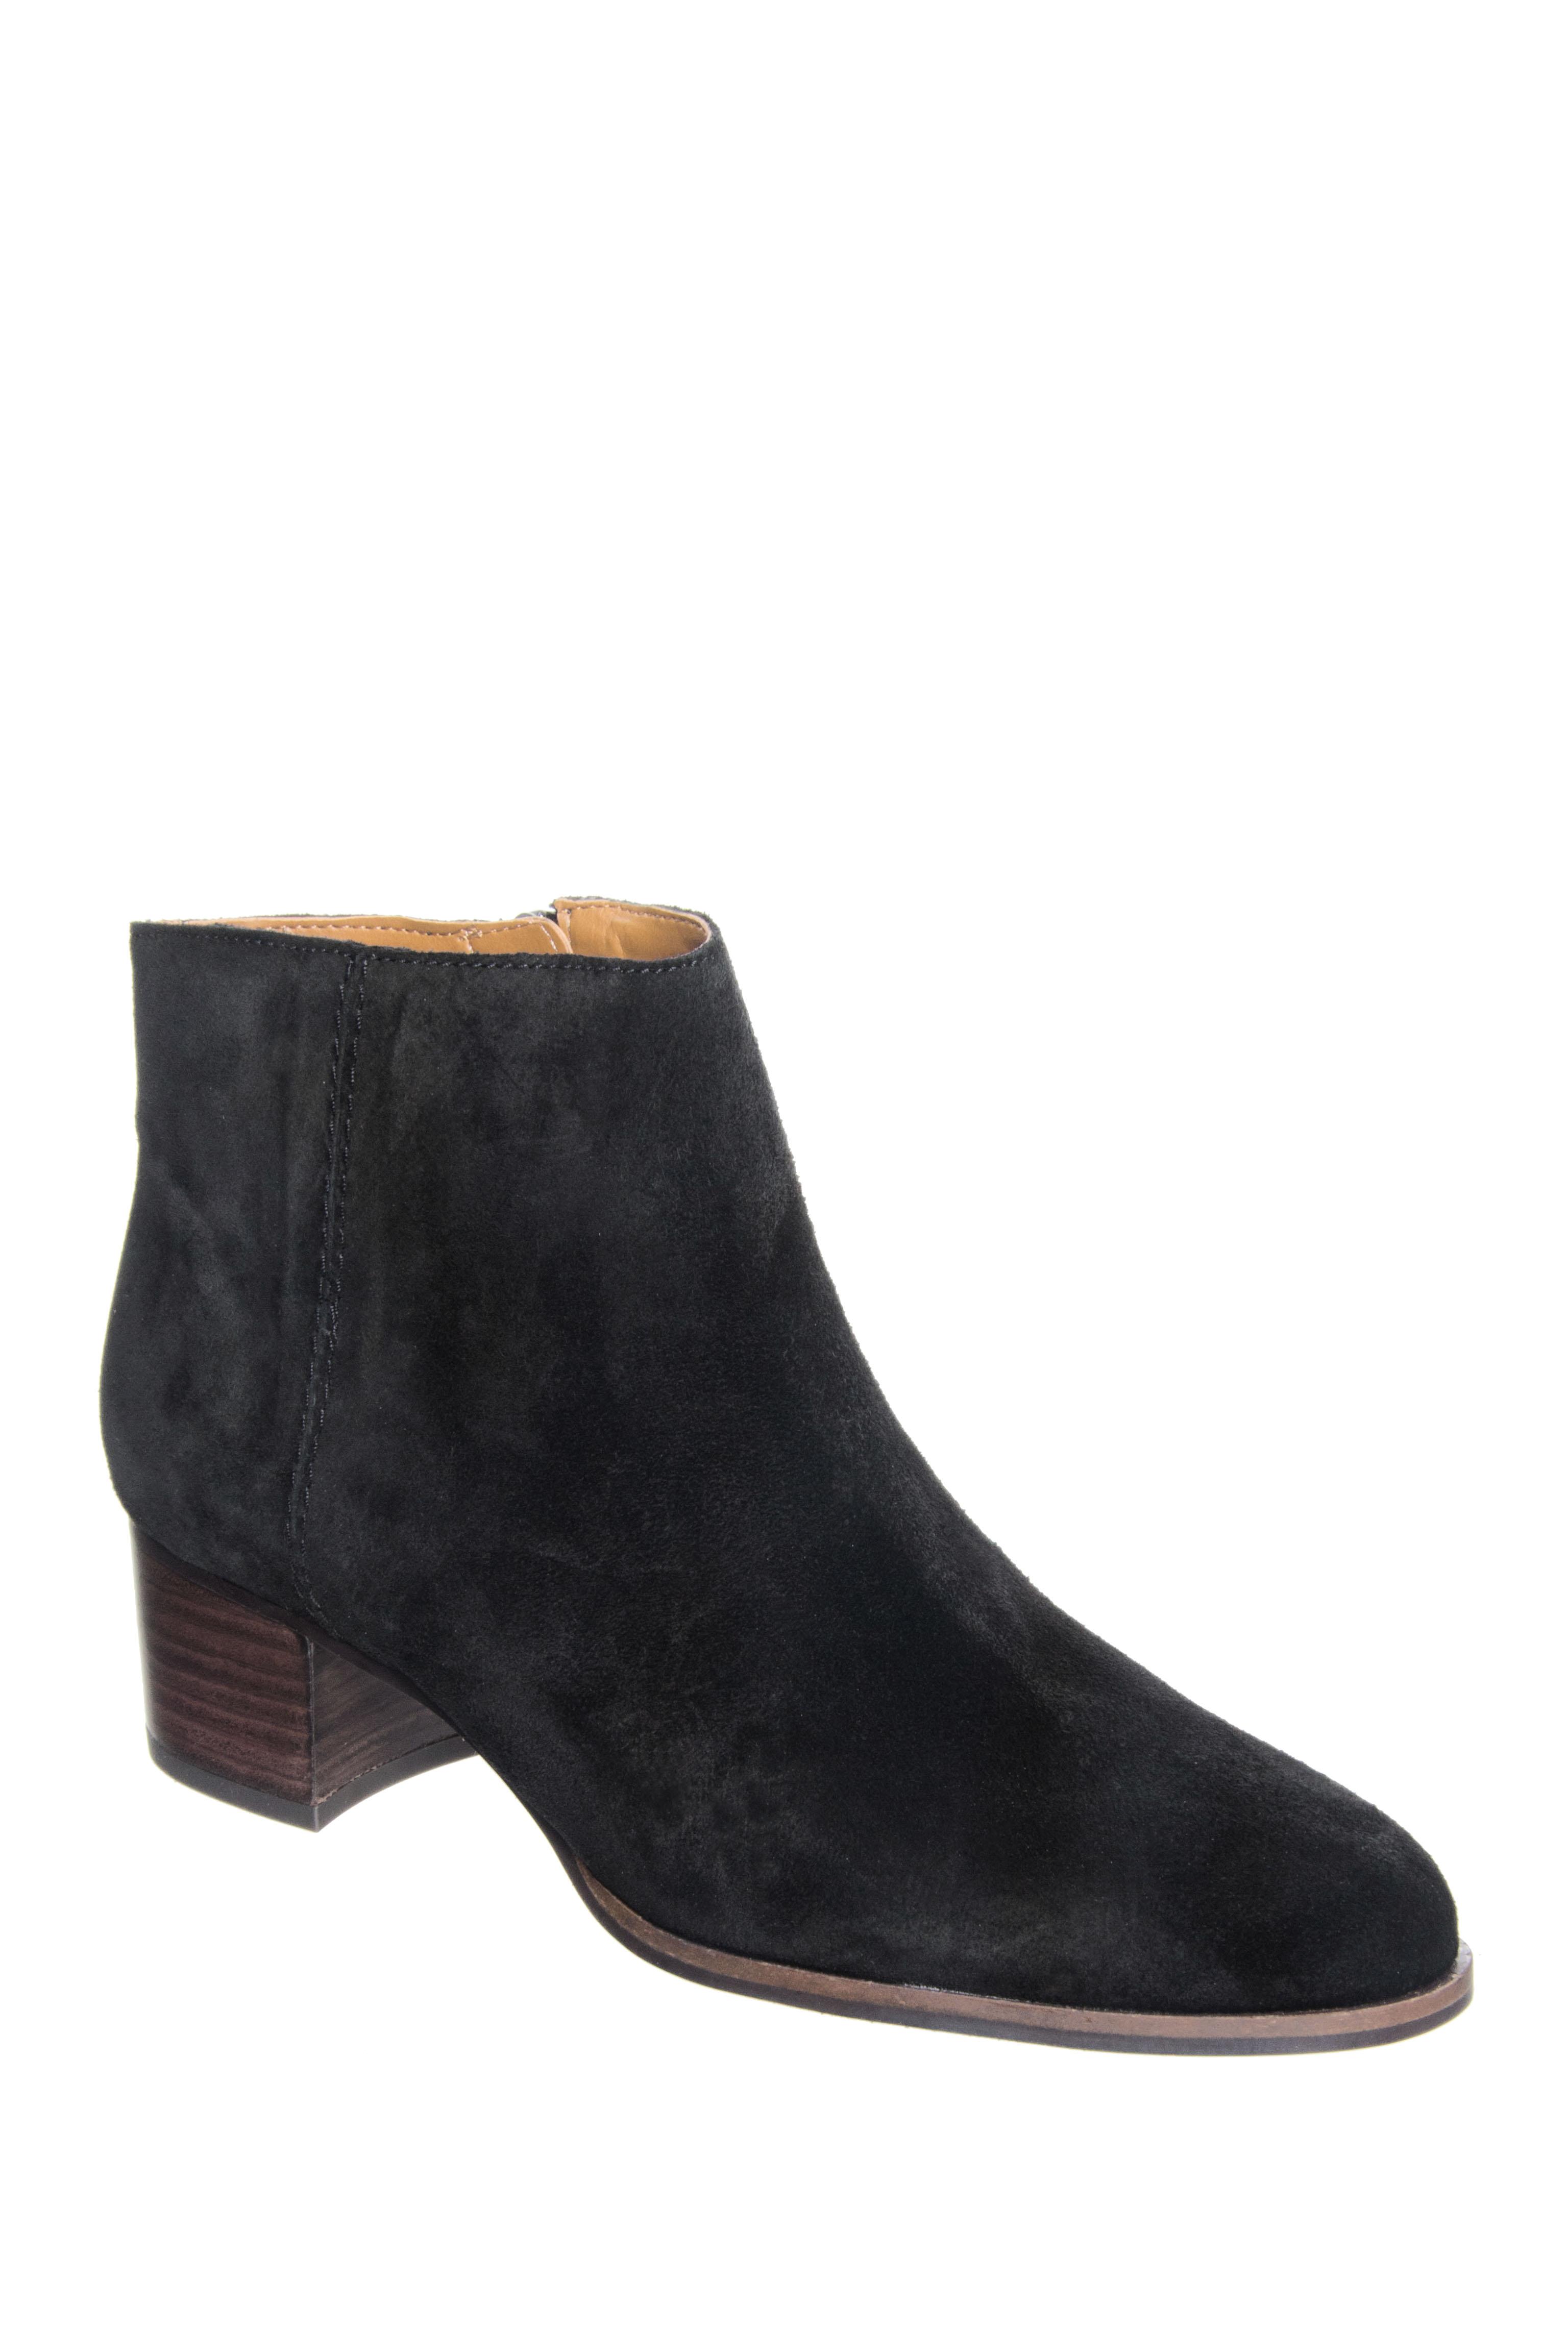 Franco Sarto Catina Mid Heel Booties - Black